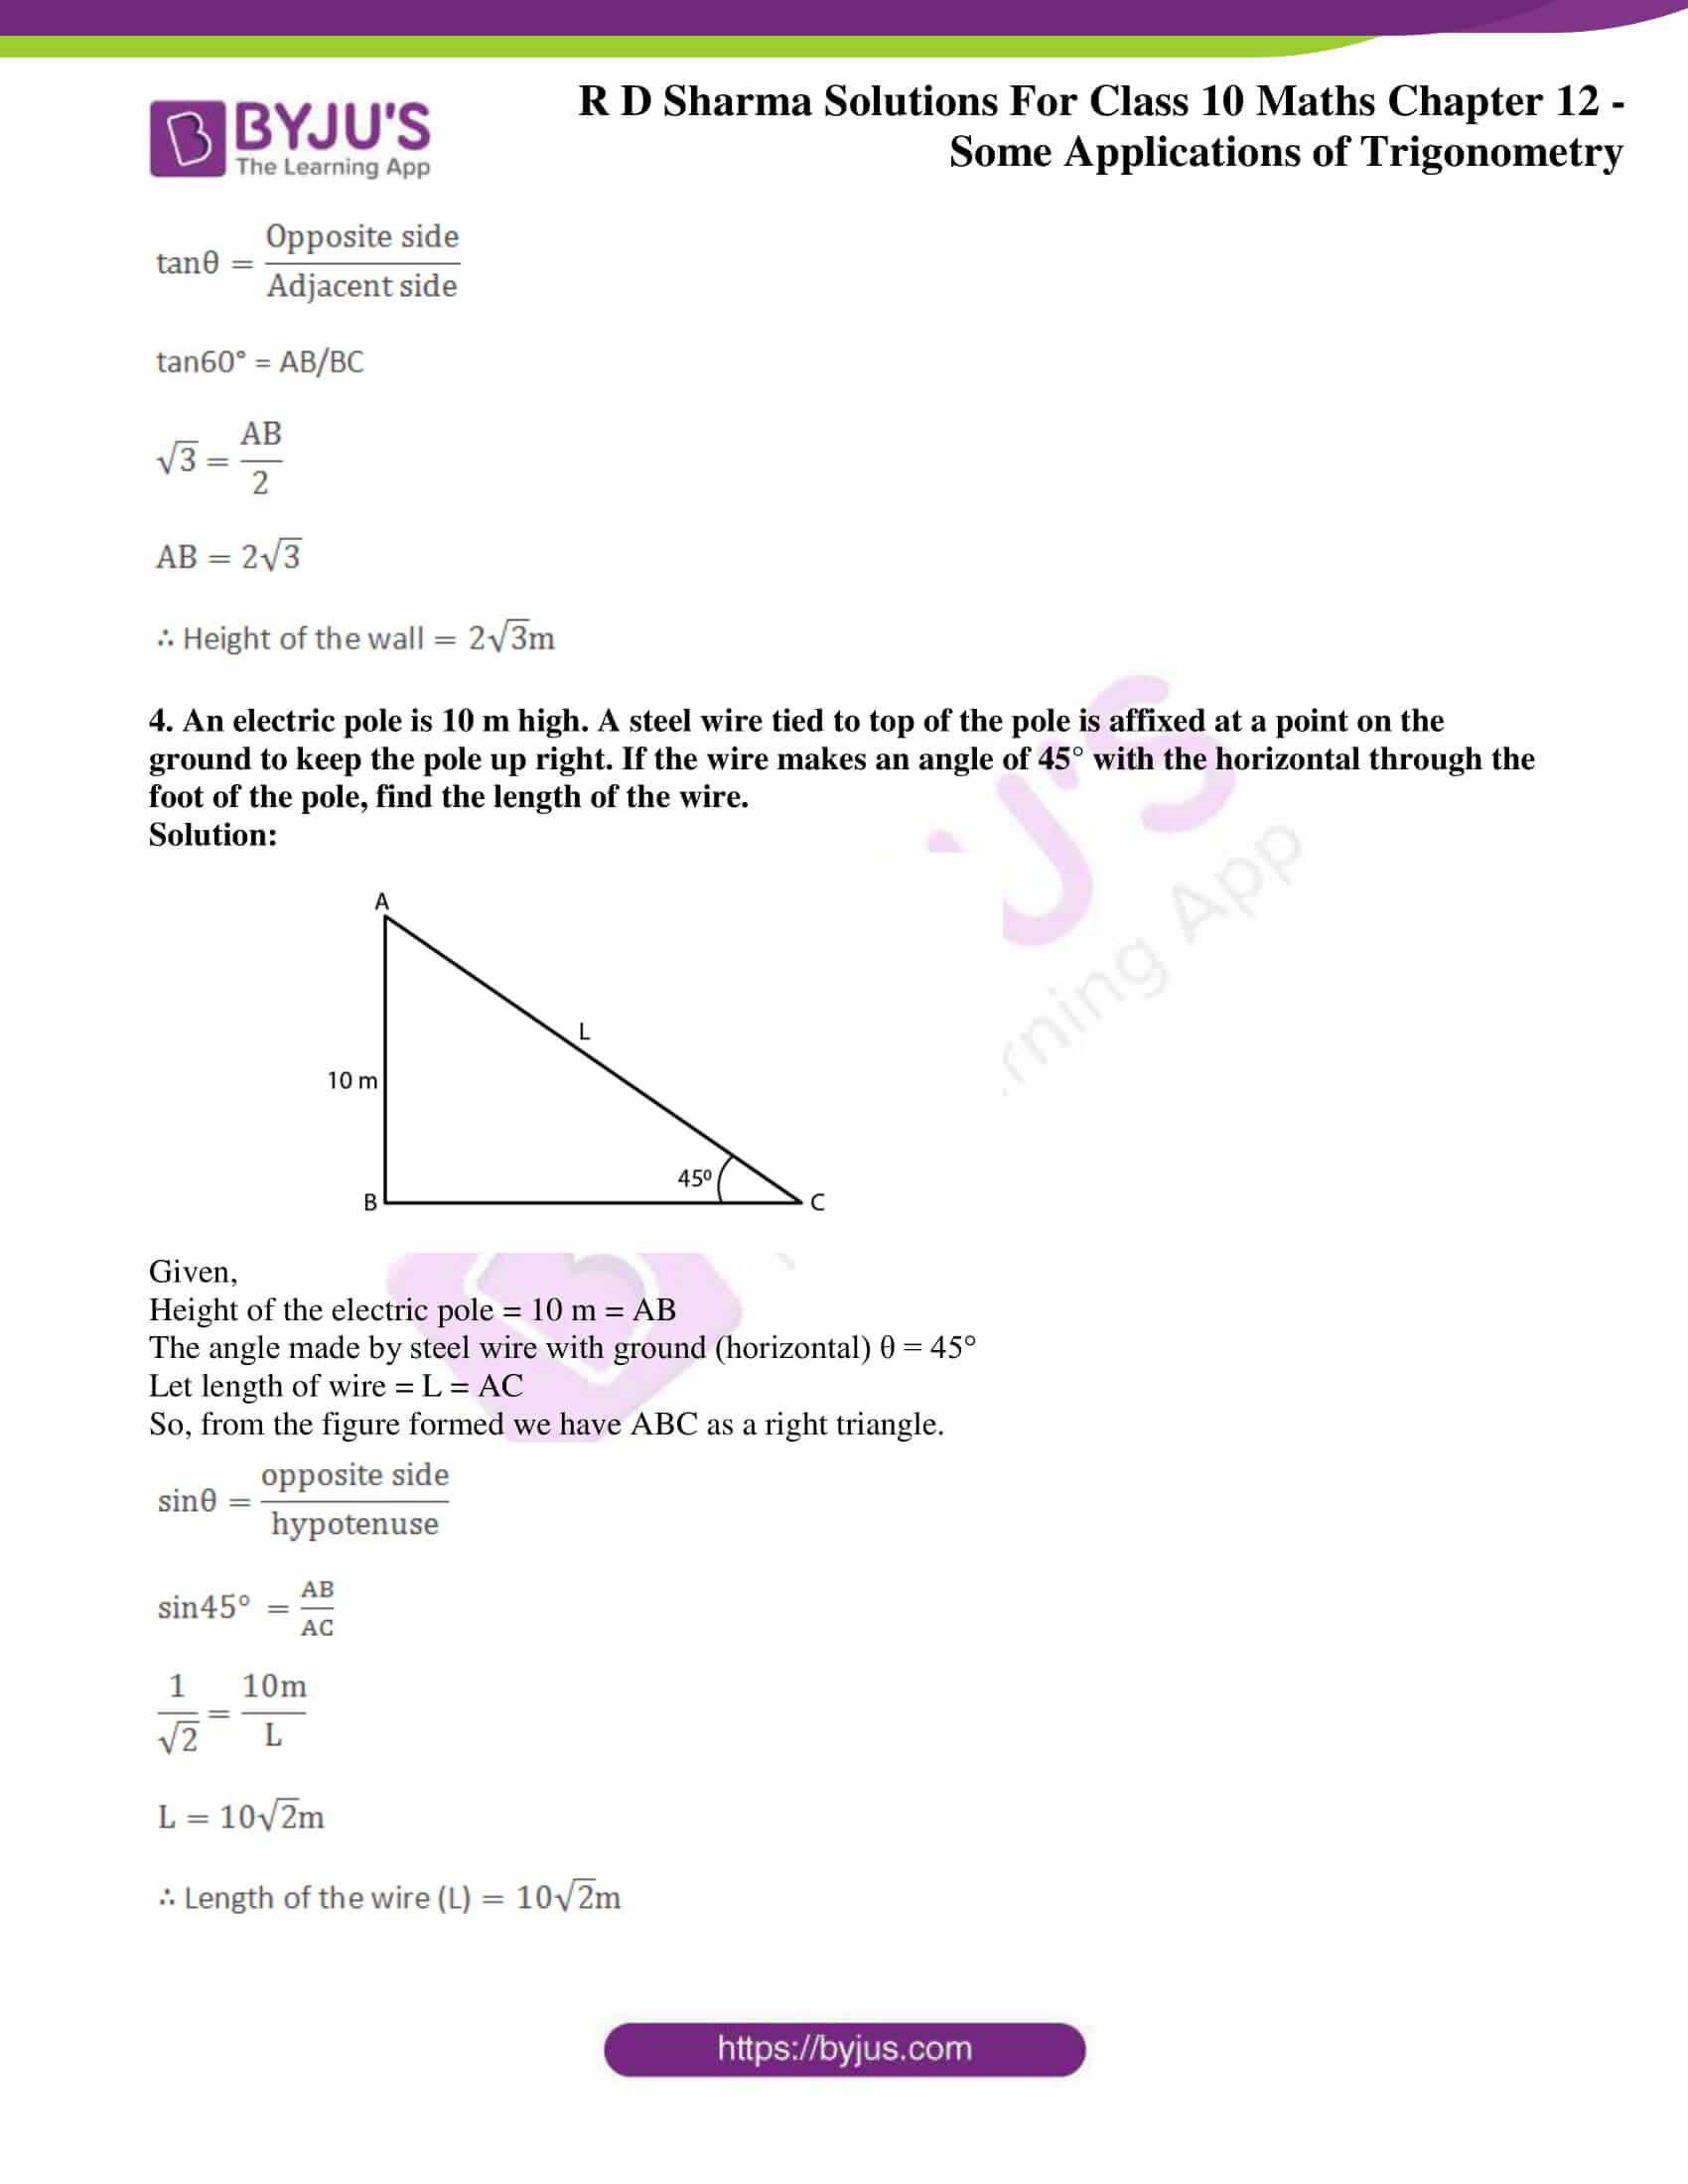 rd sharma class 10 chapter 12 applications trigonometry solutions 03